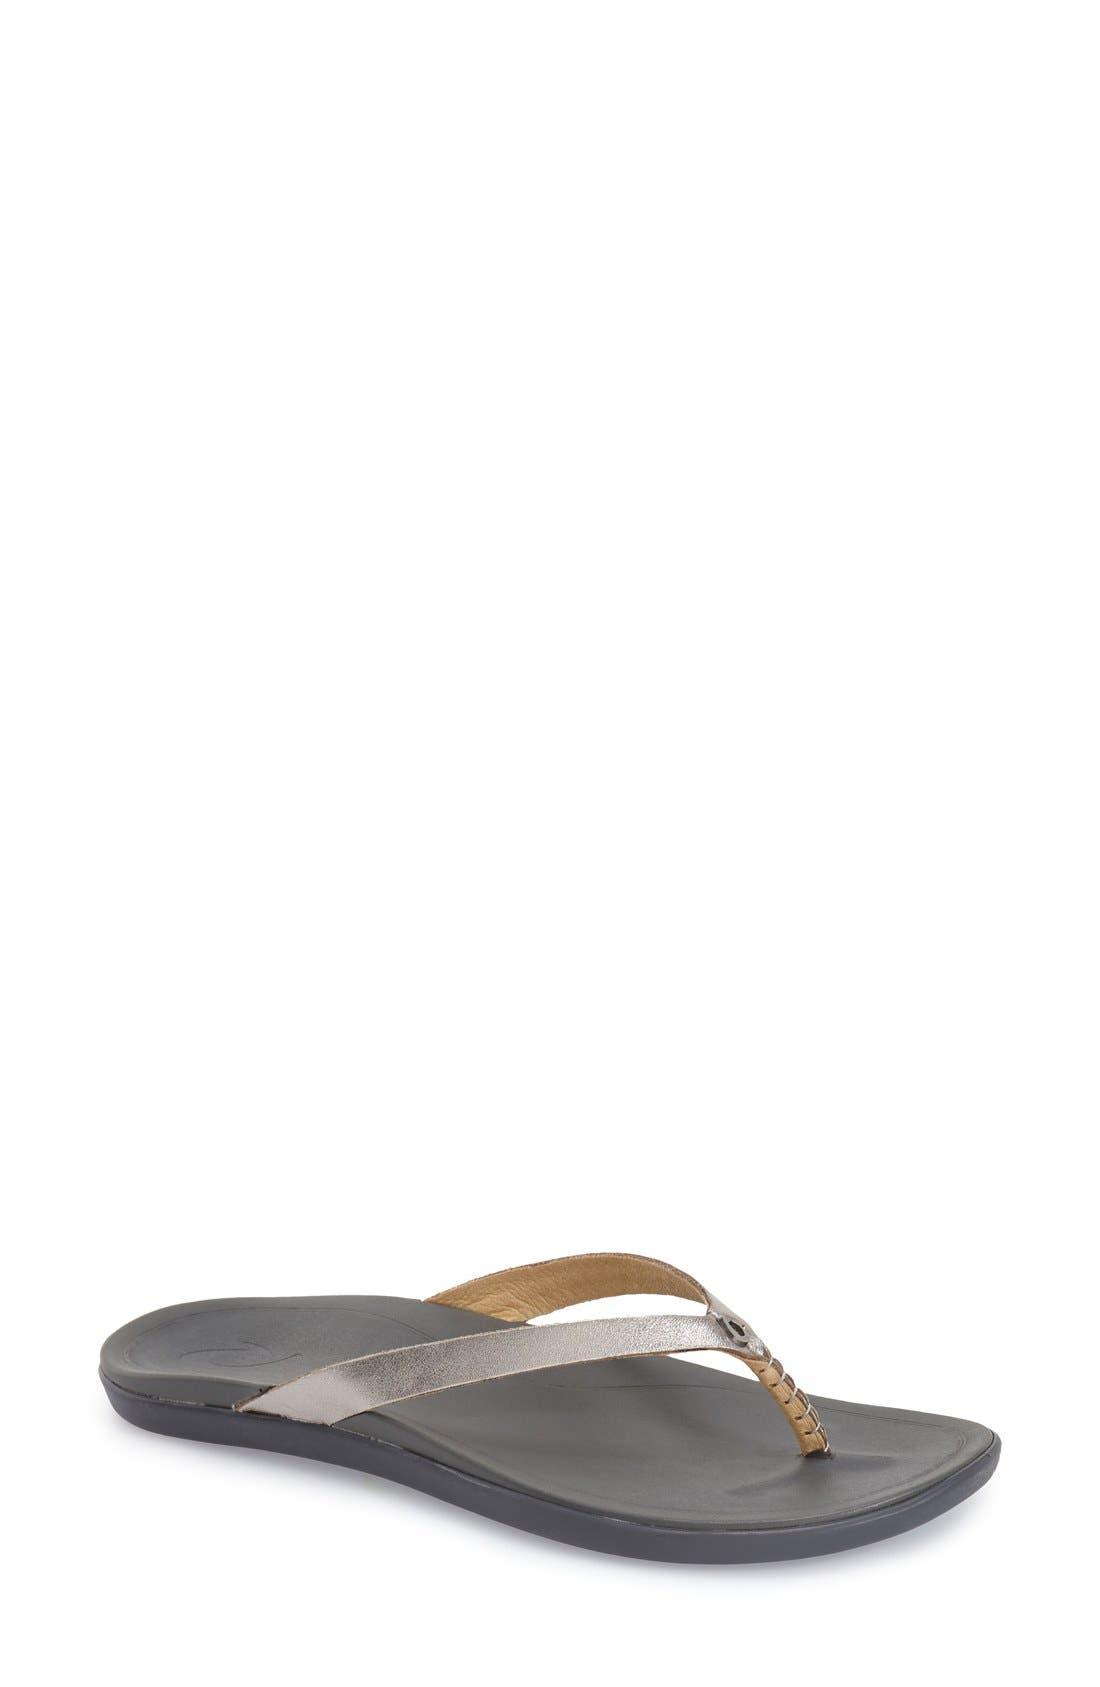 OluKai 'Ho Opio' Leather Flip Flop (Women)